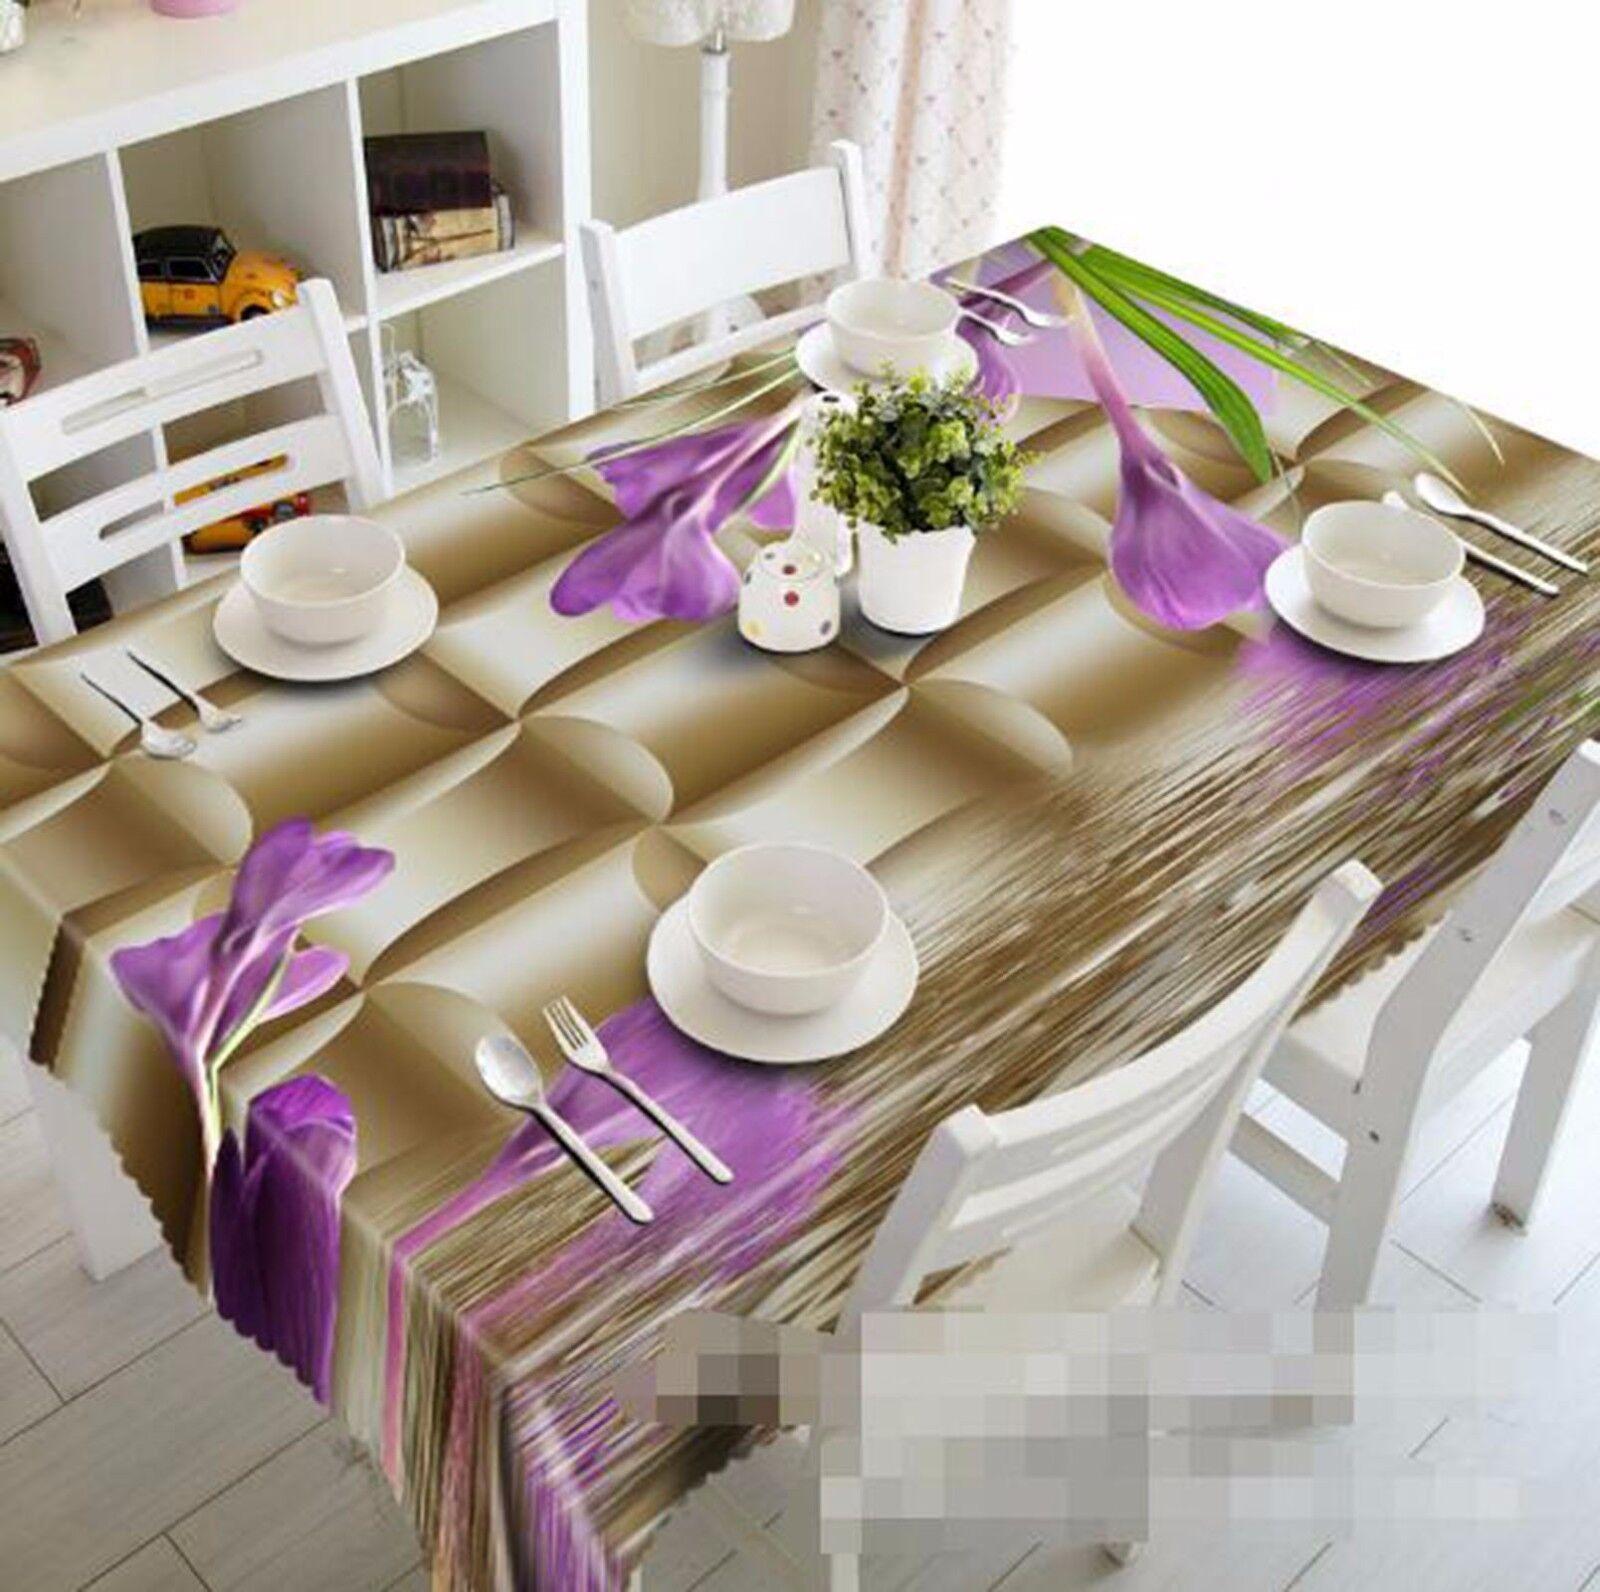 3D Petals 408 Tablecloth Table Cover Cloth Birthday Party AJ WALLPAPER UK Lemon